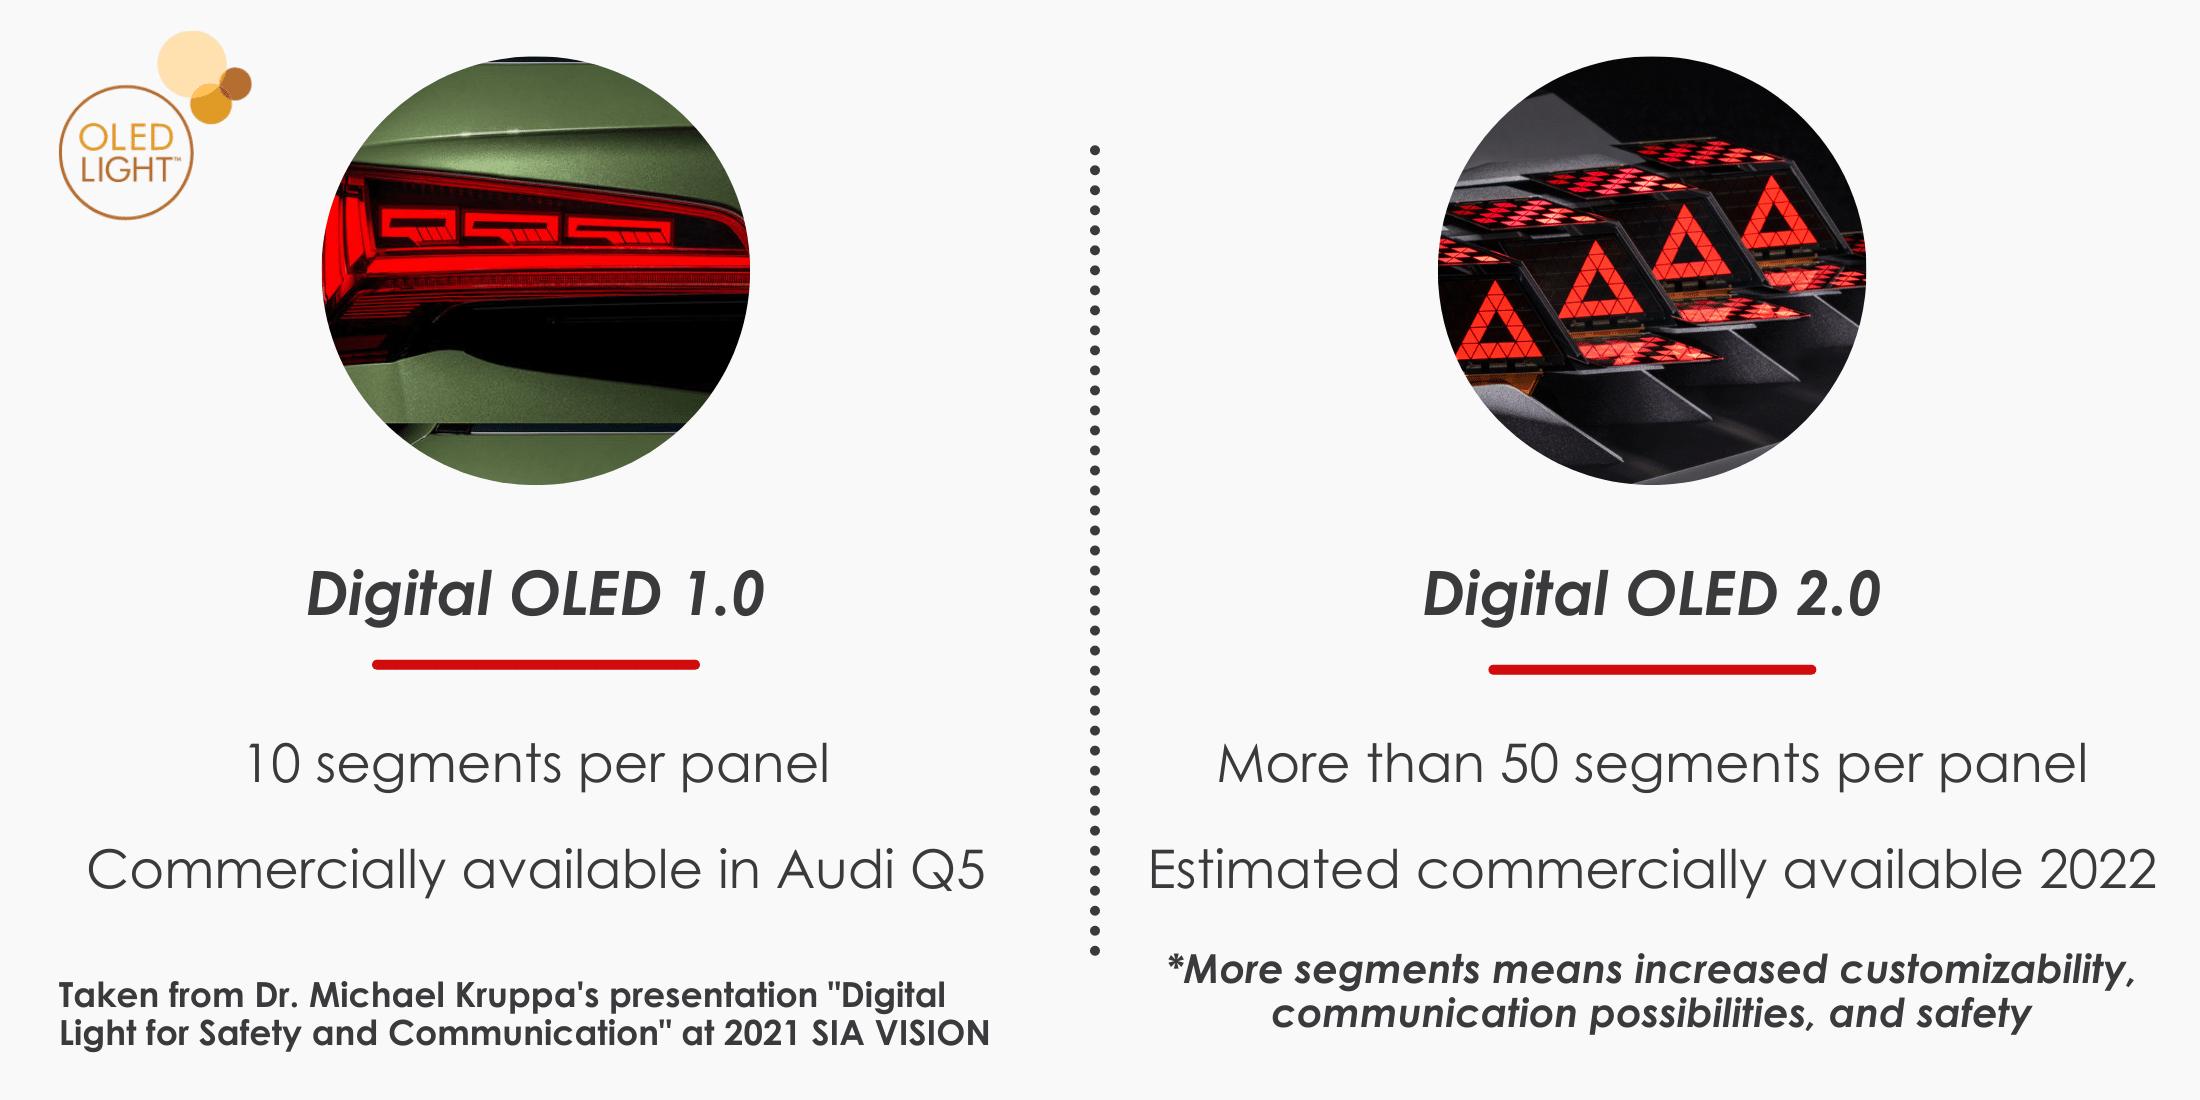 Digital OLED Technology Comparison